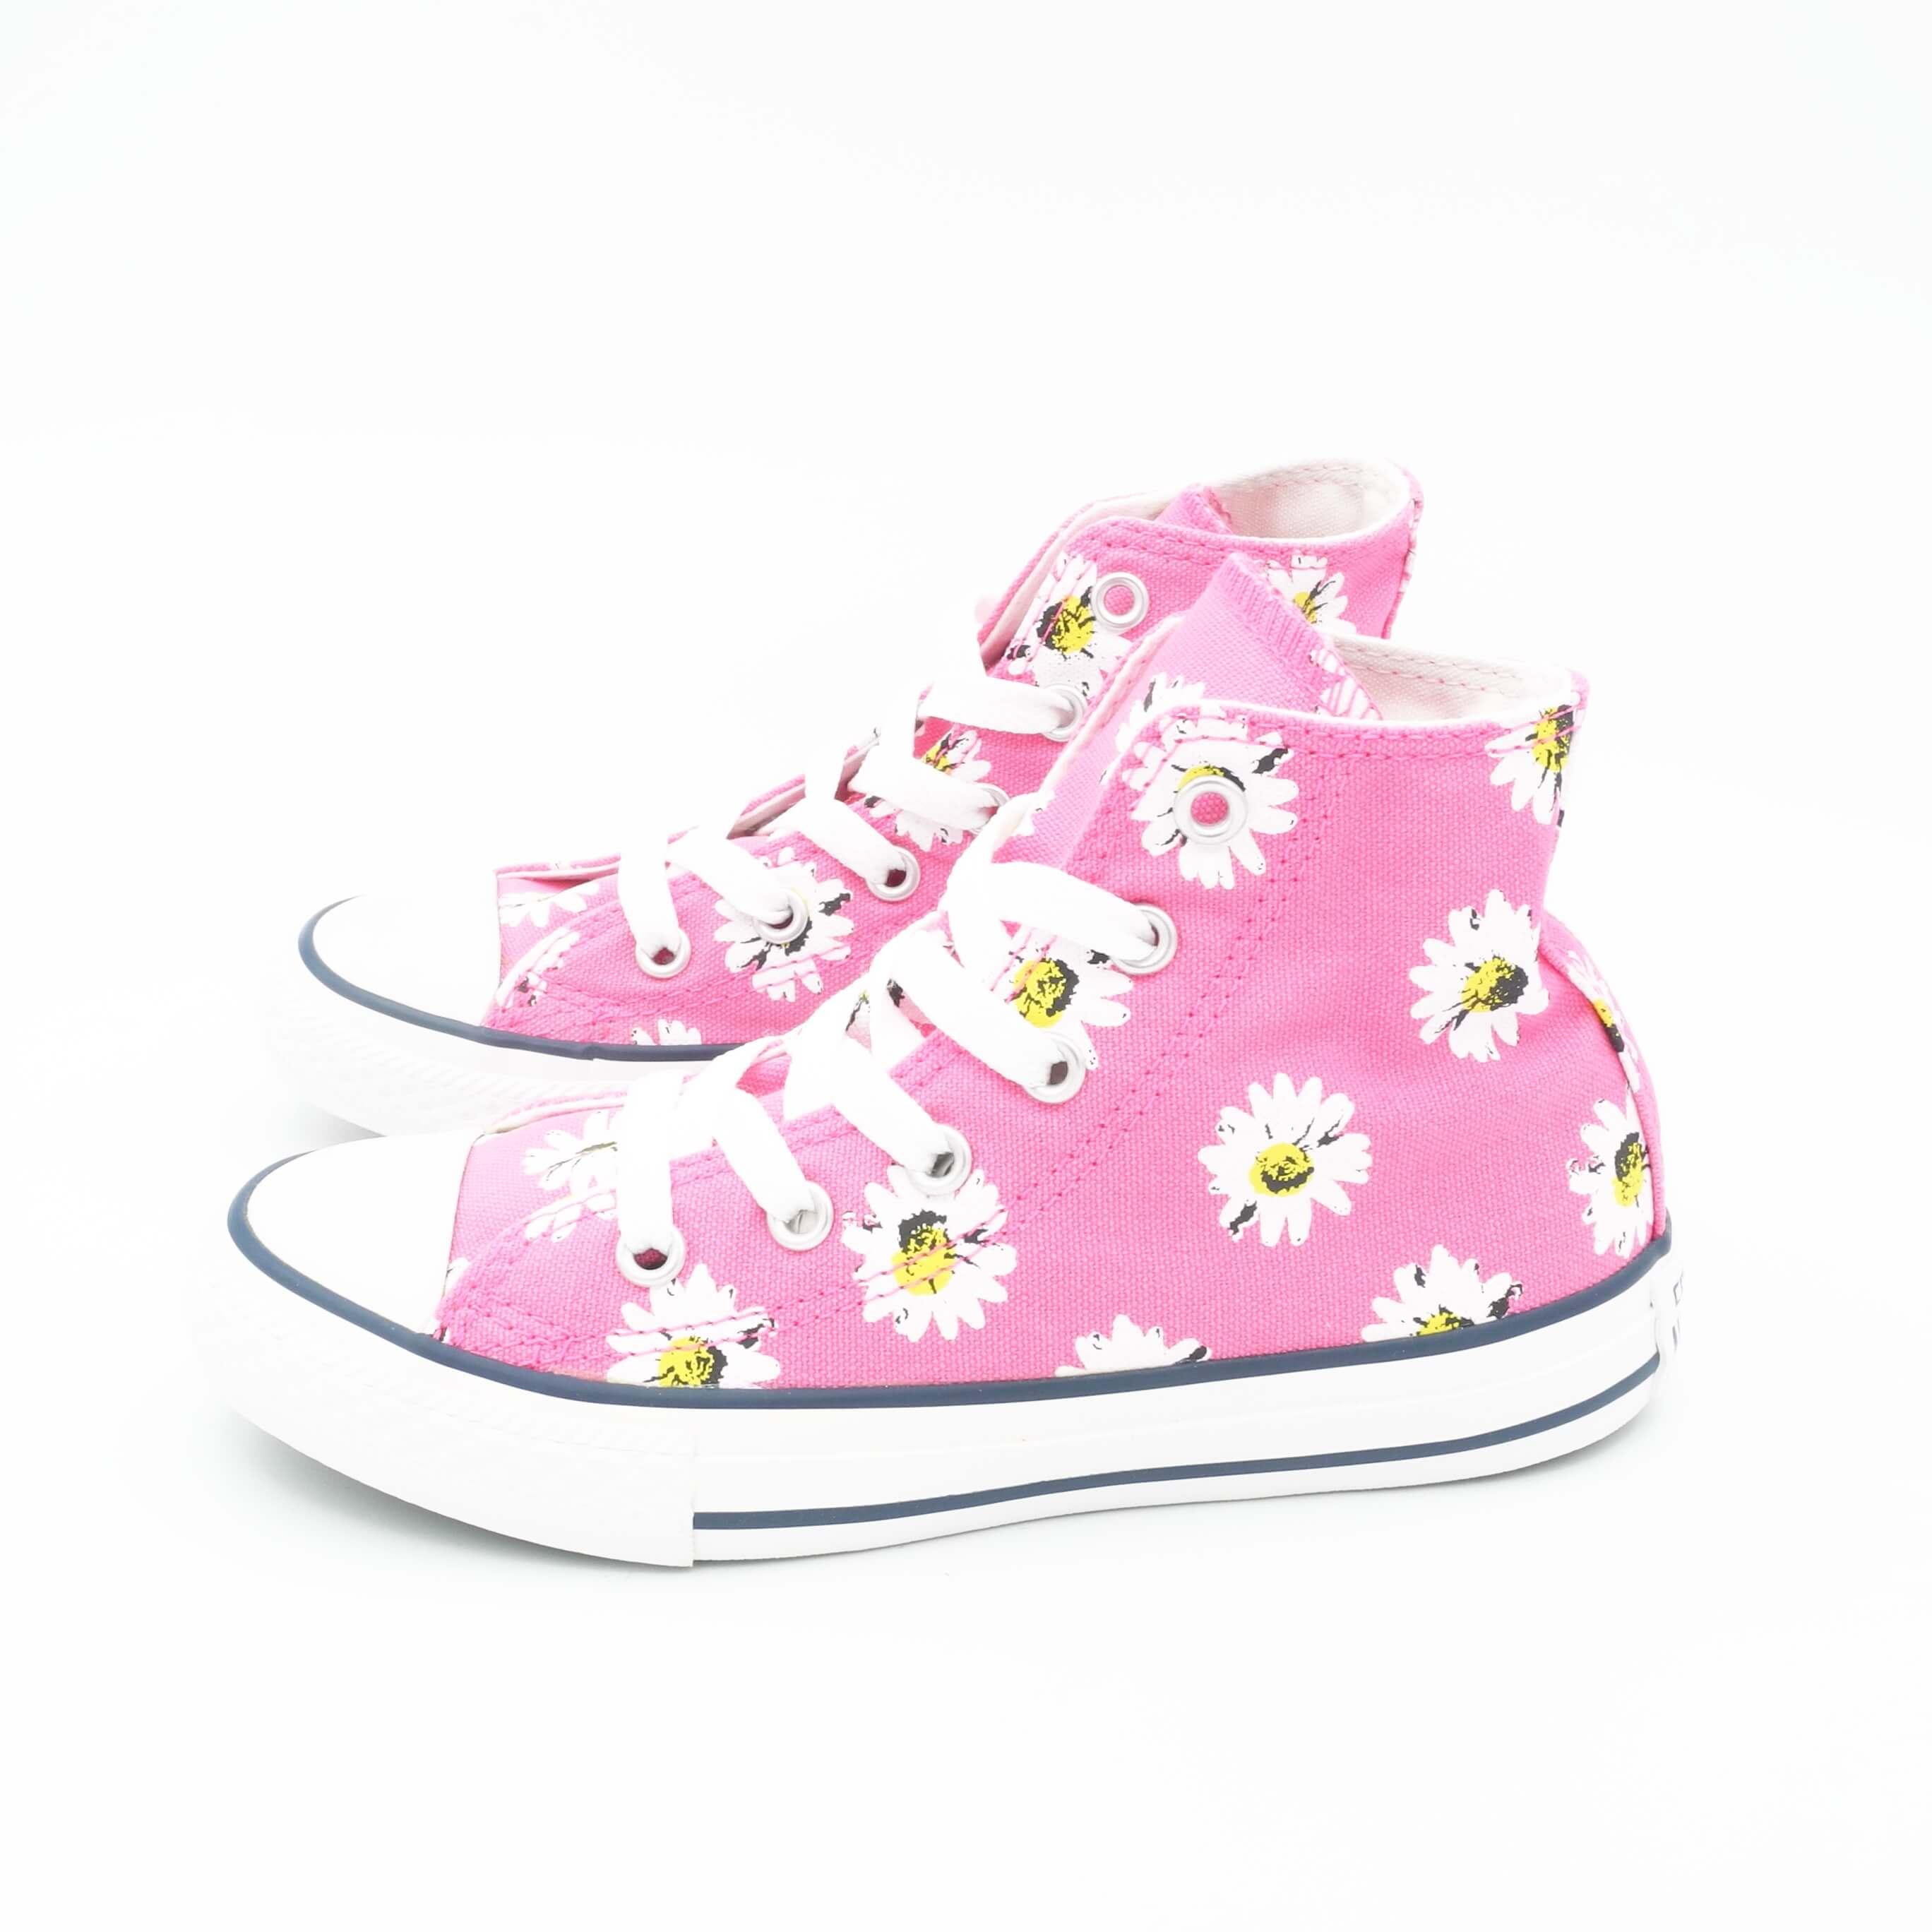 converse bambina fiori